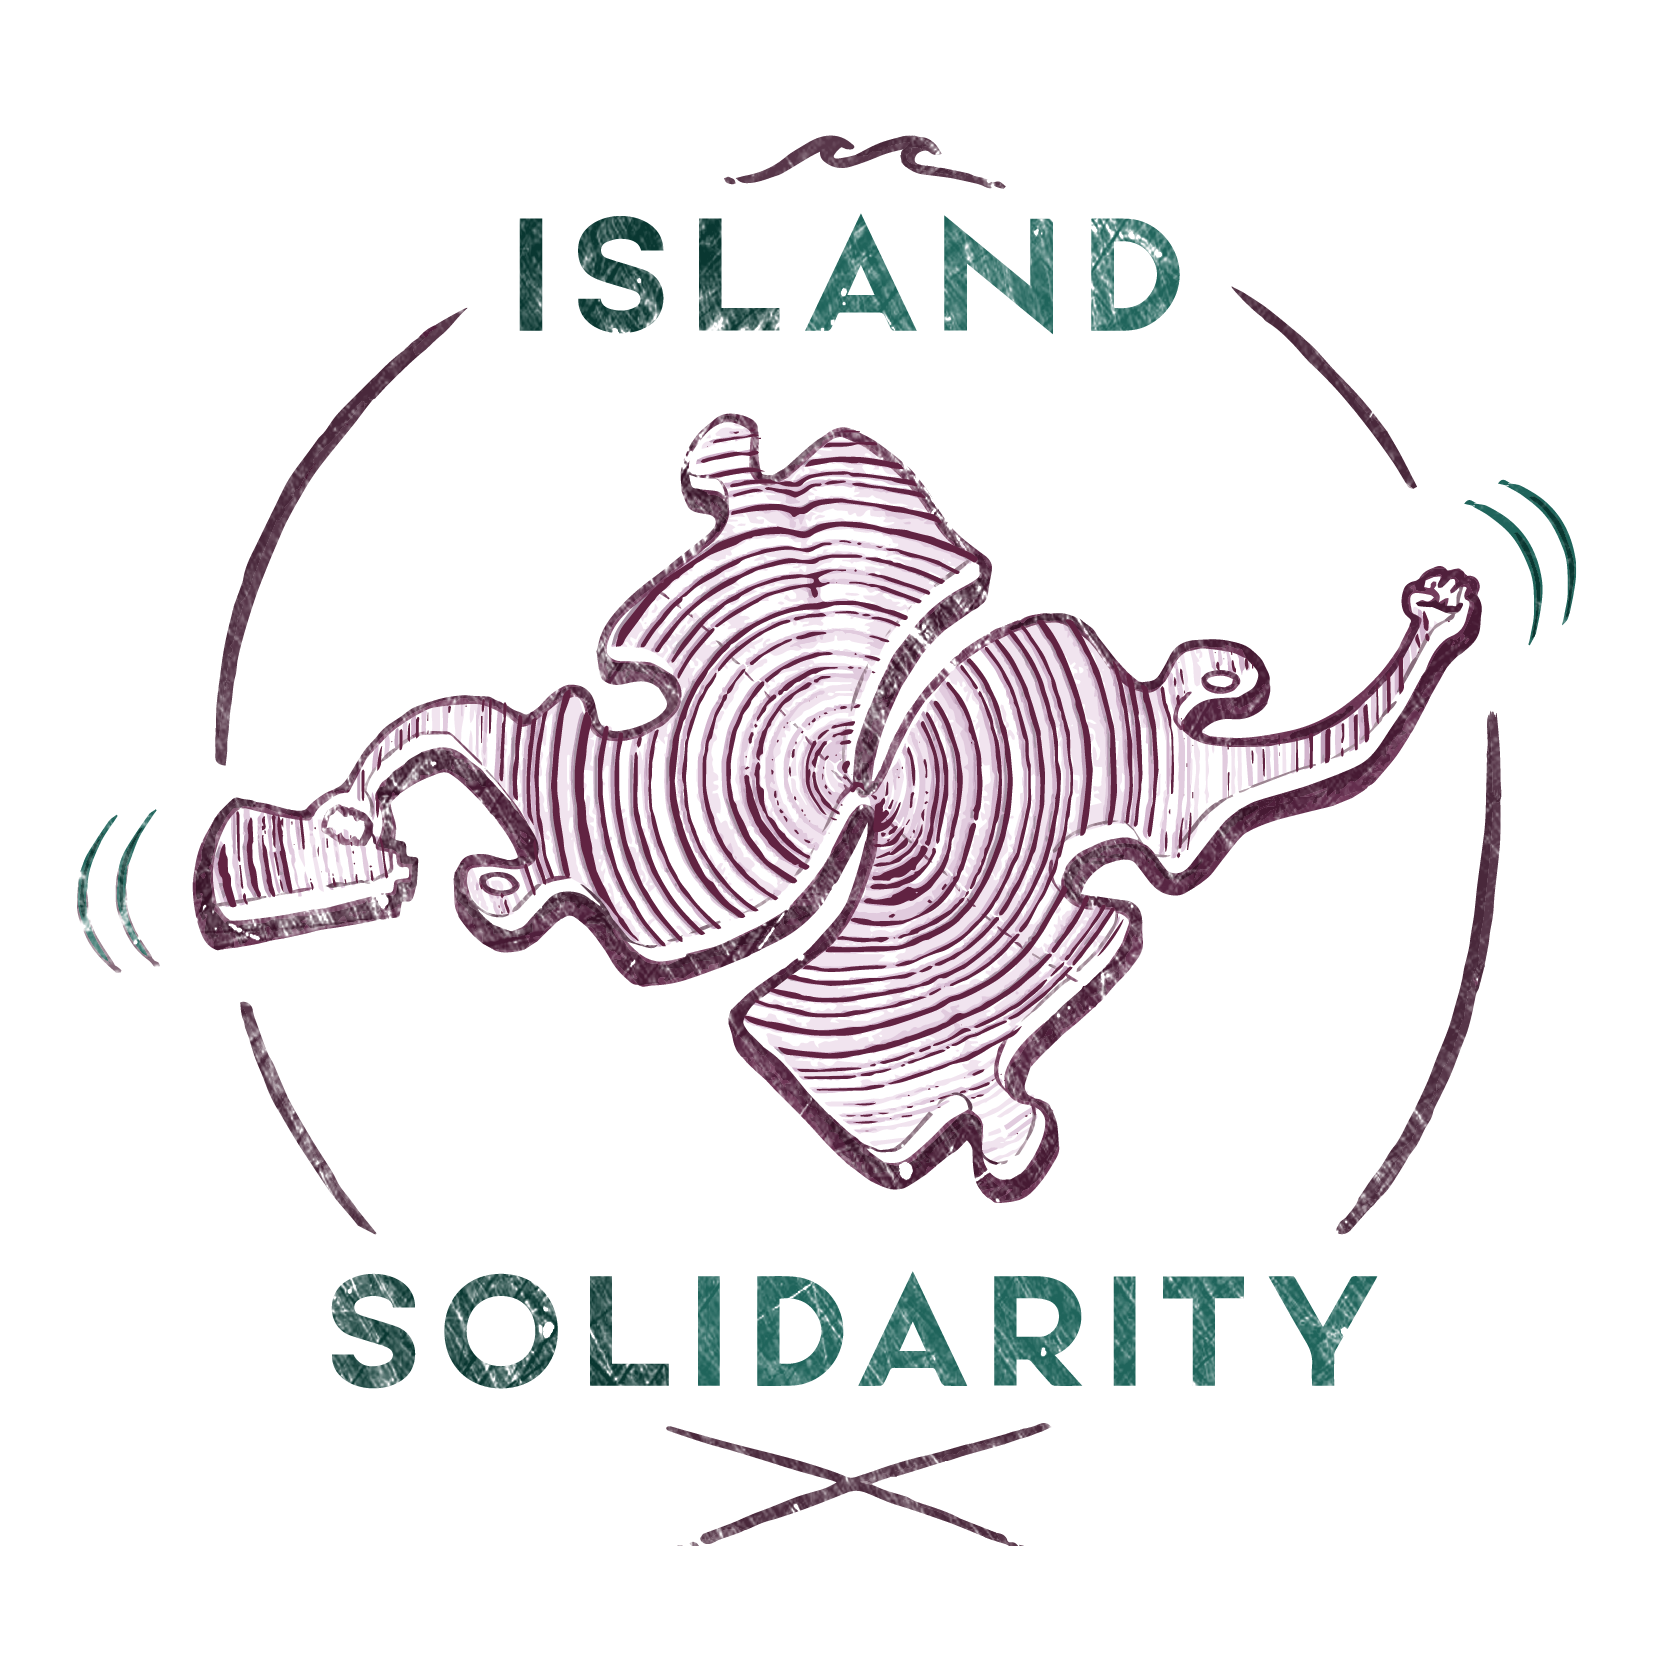 Island Solidarity